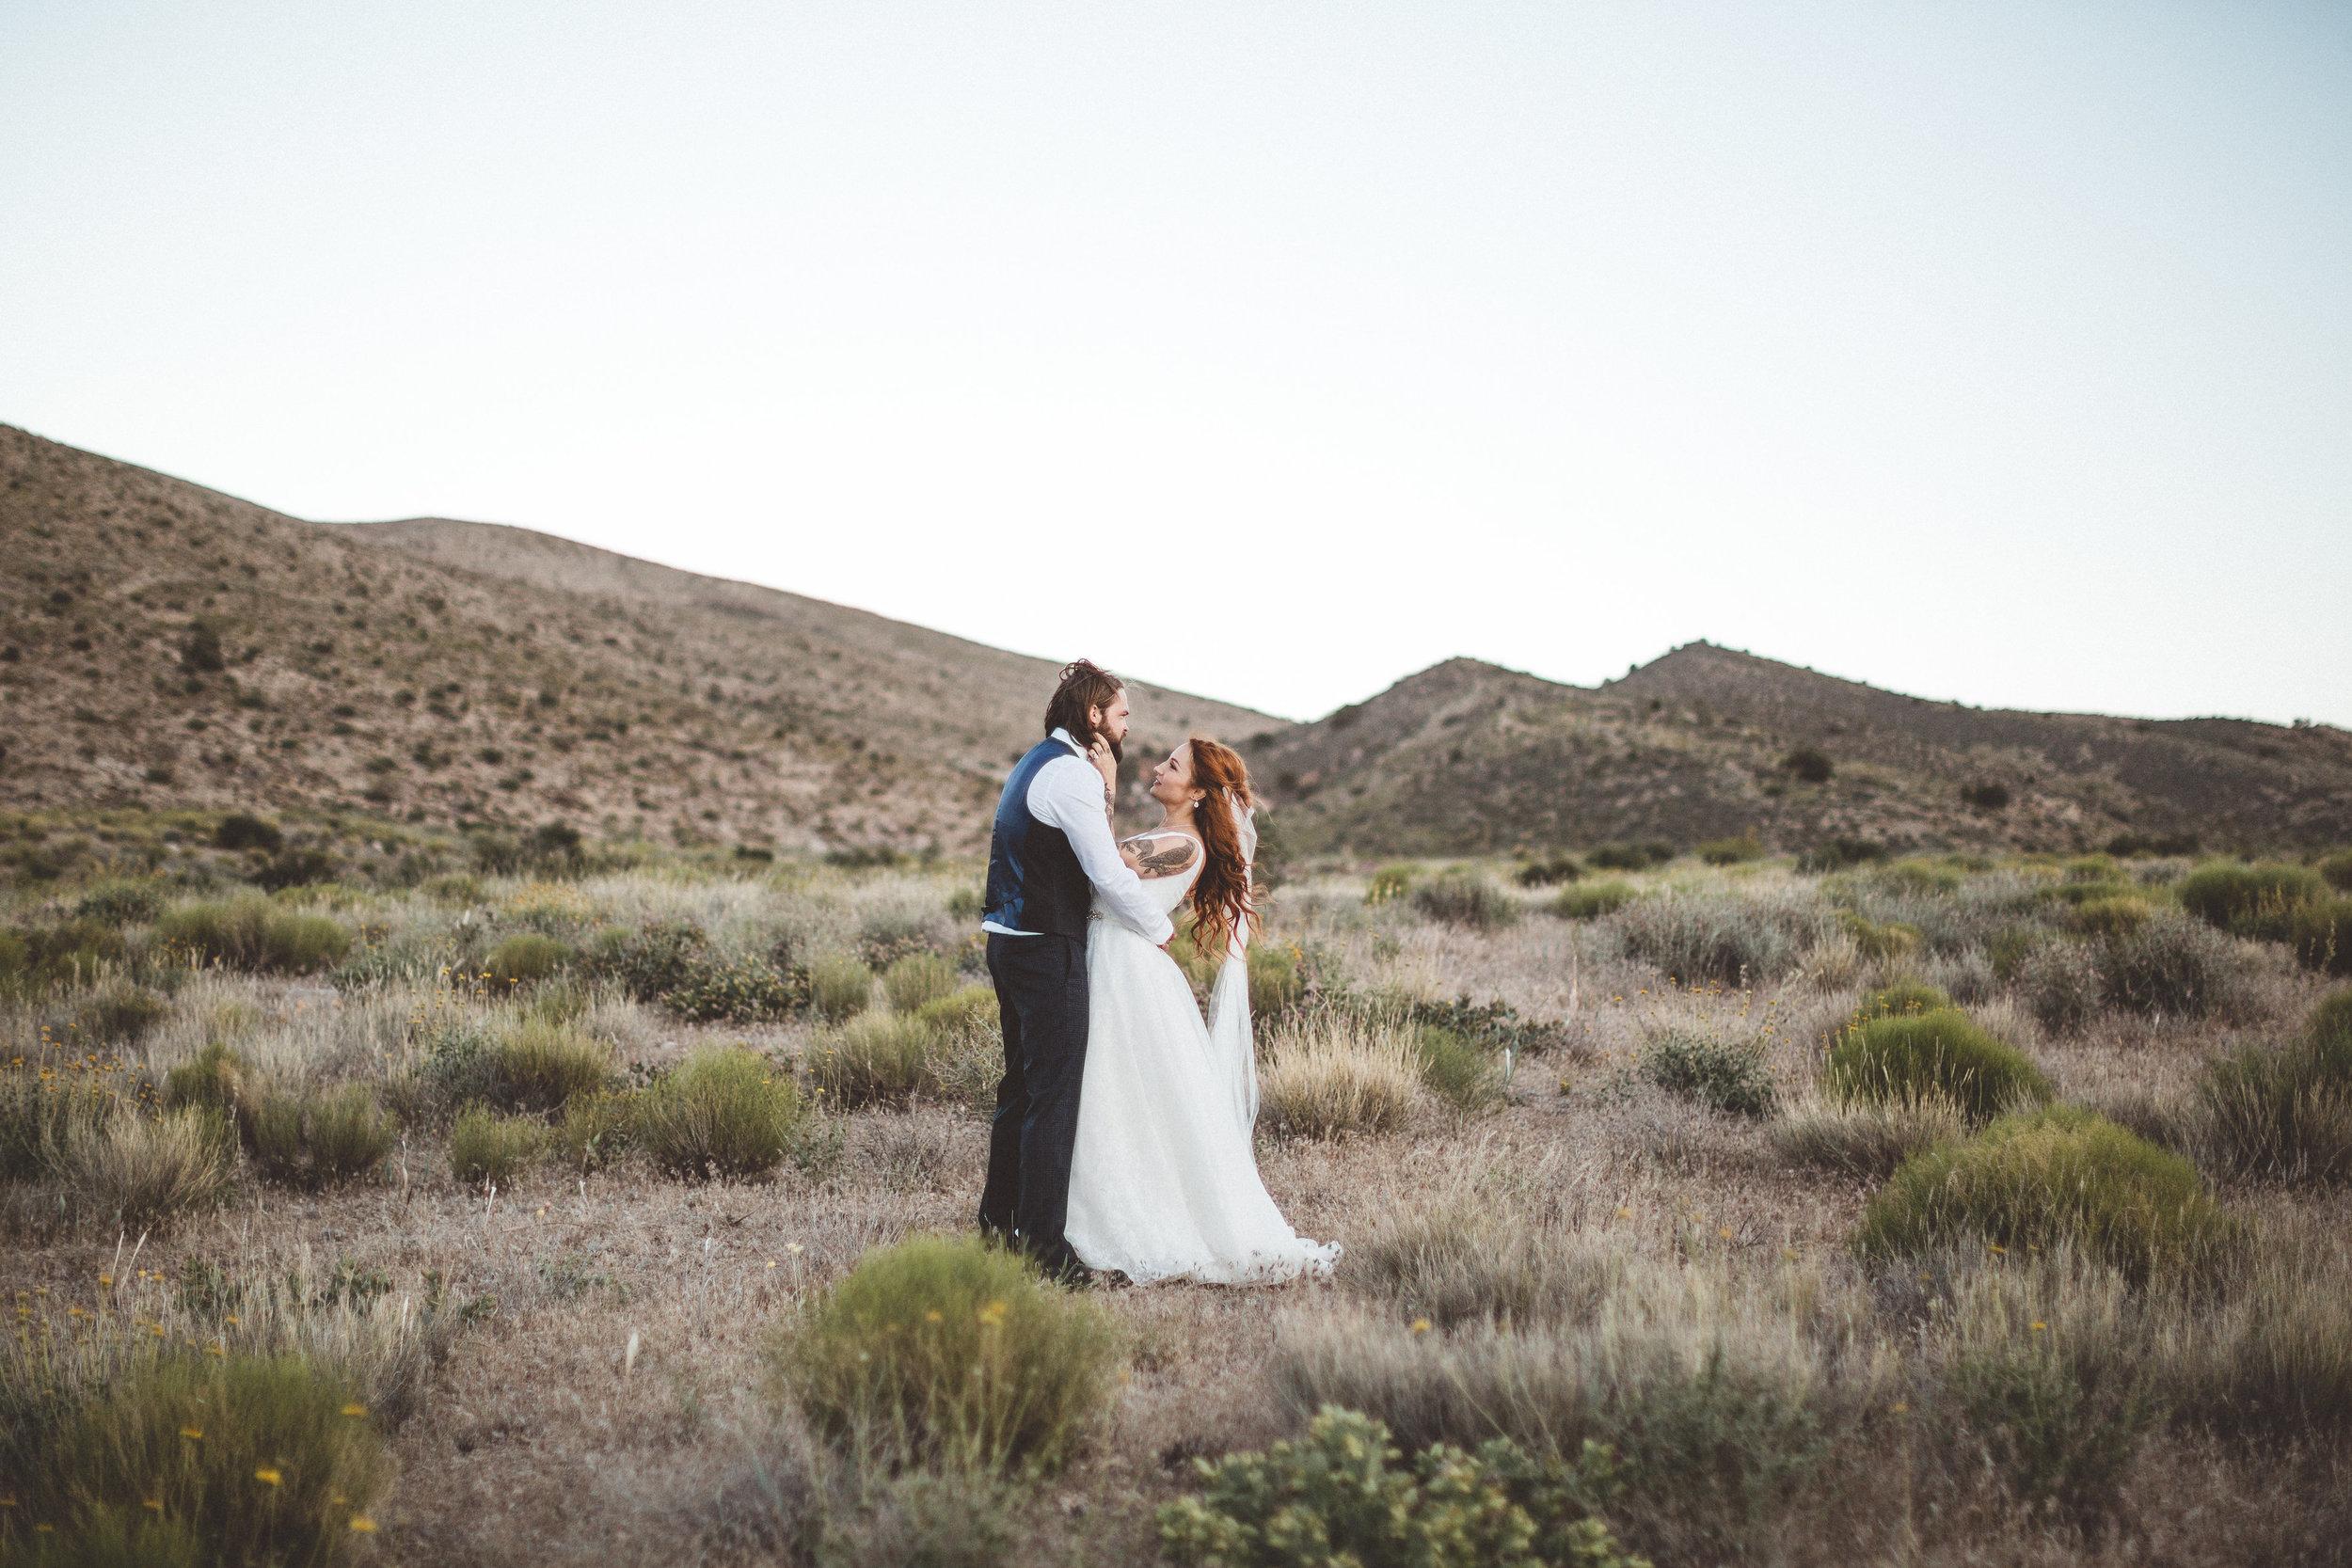 nicoletta-and-adams-rad-las-vegas-desert-elopement26.jpg